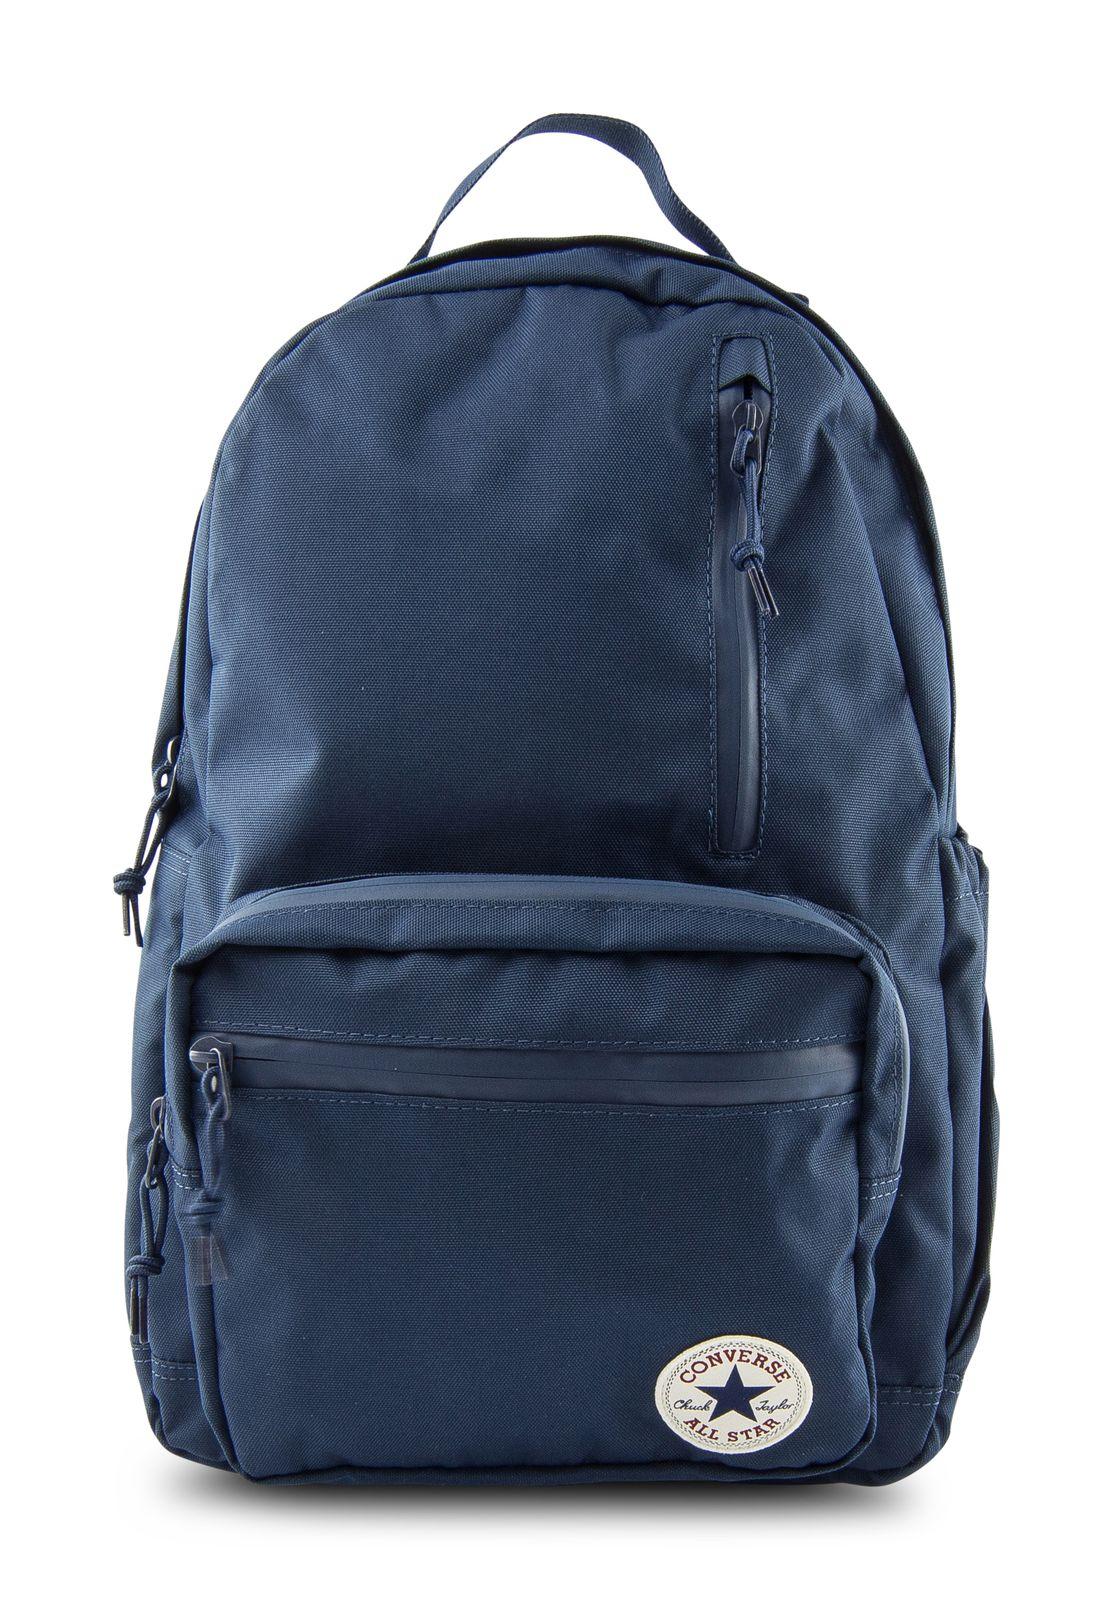 73ce195e41cf CONVERSE-Rucksack-Go-Backpack-Navy-152997.jpg